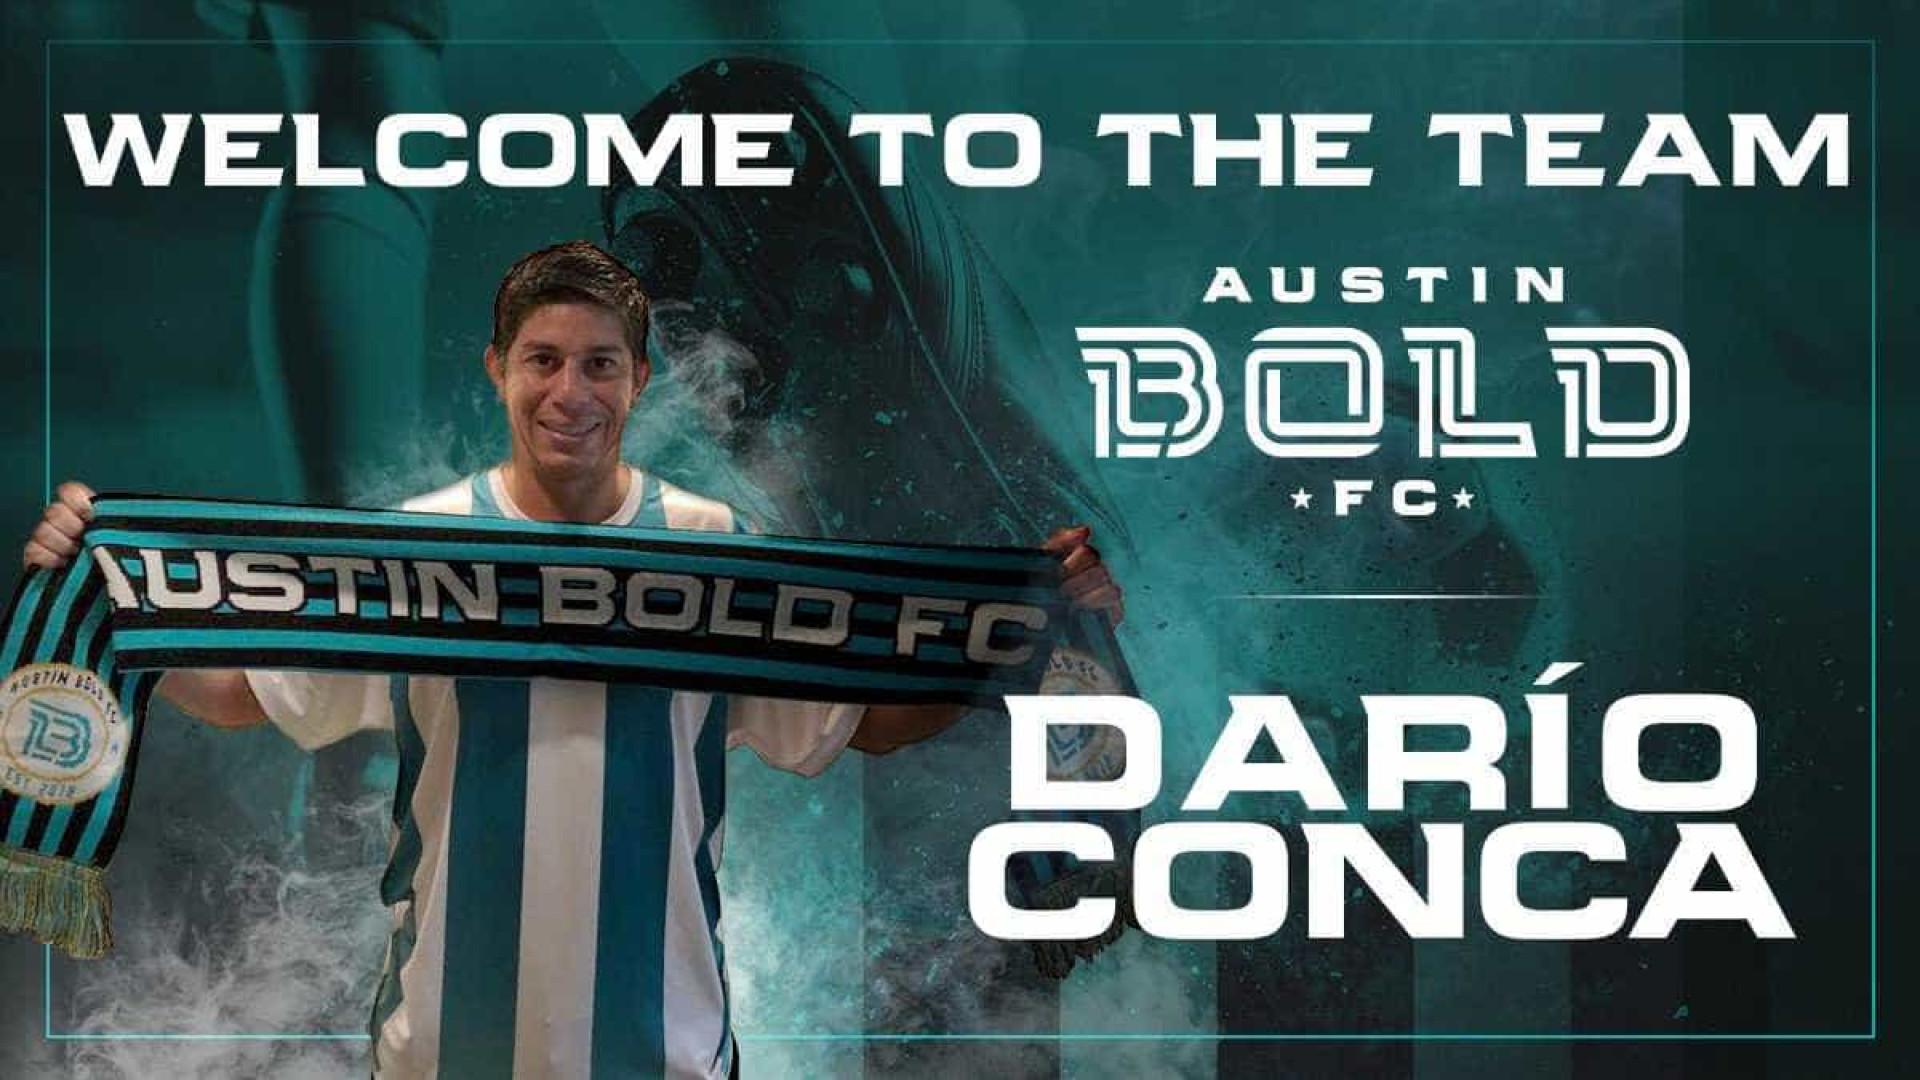 Austin Bold, dos EUA, contrata o jogador argentino Darío Conca